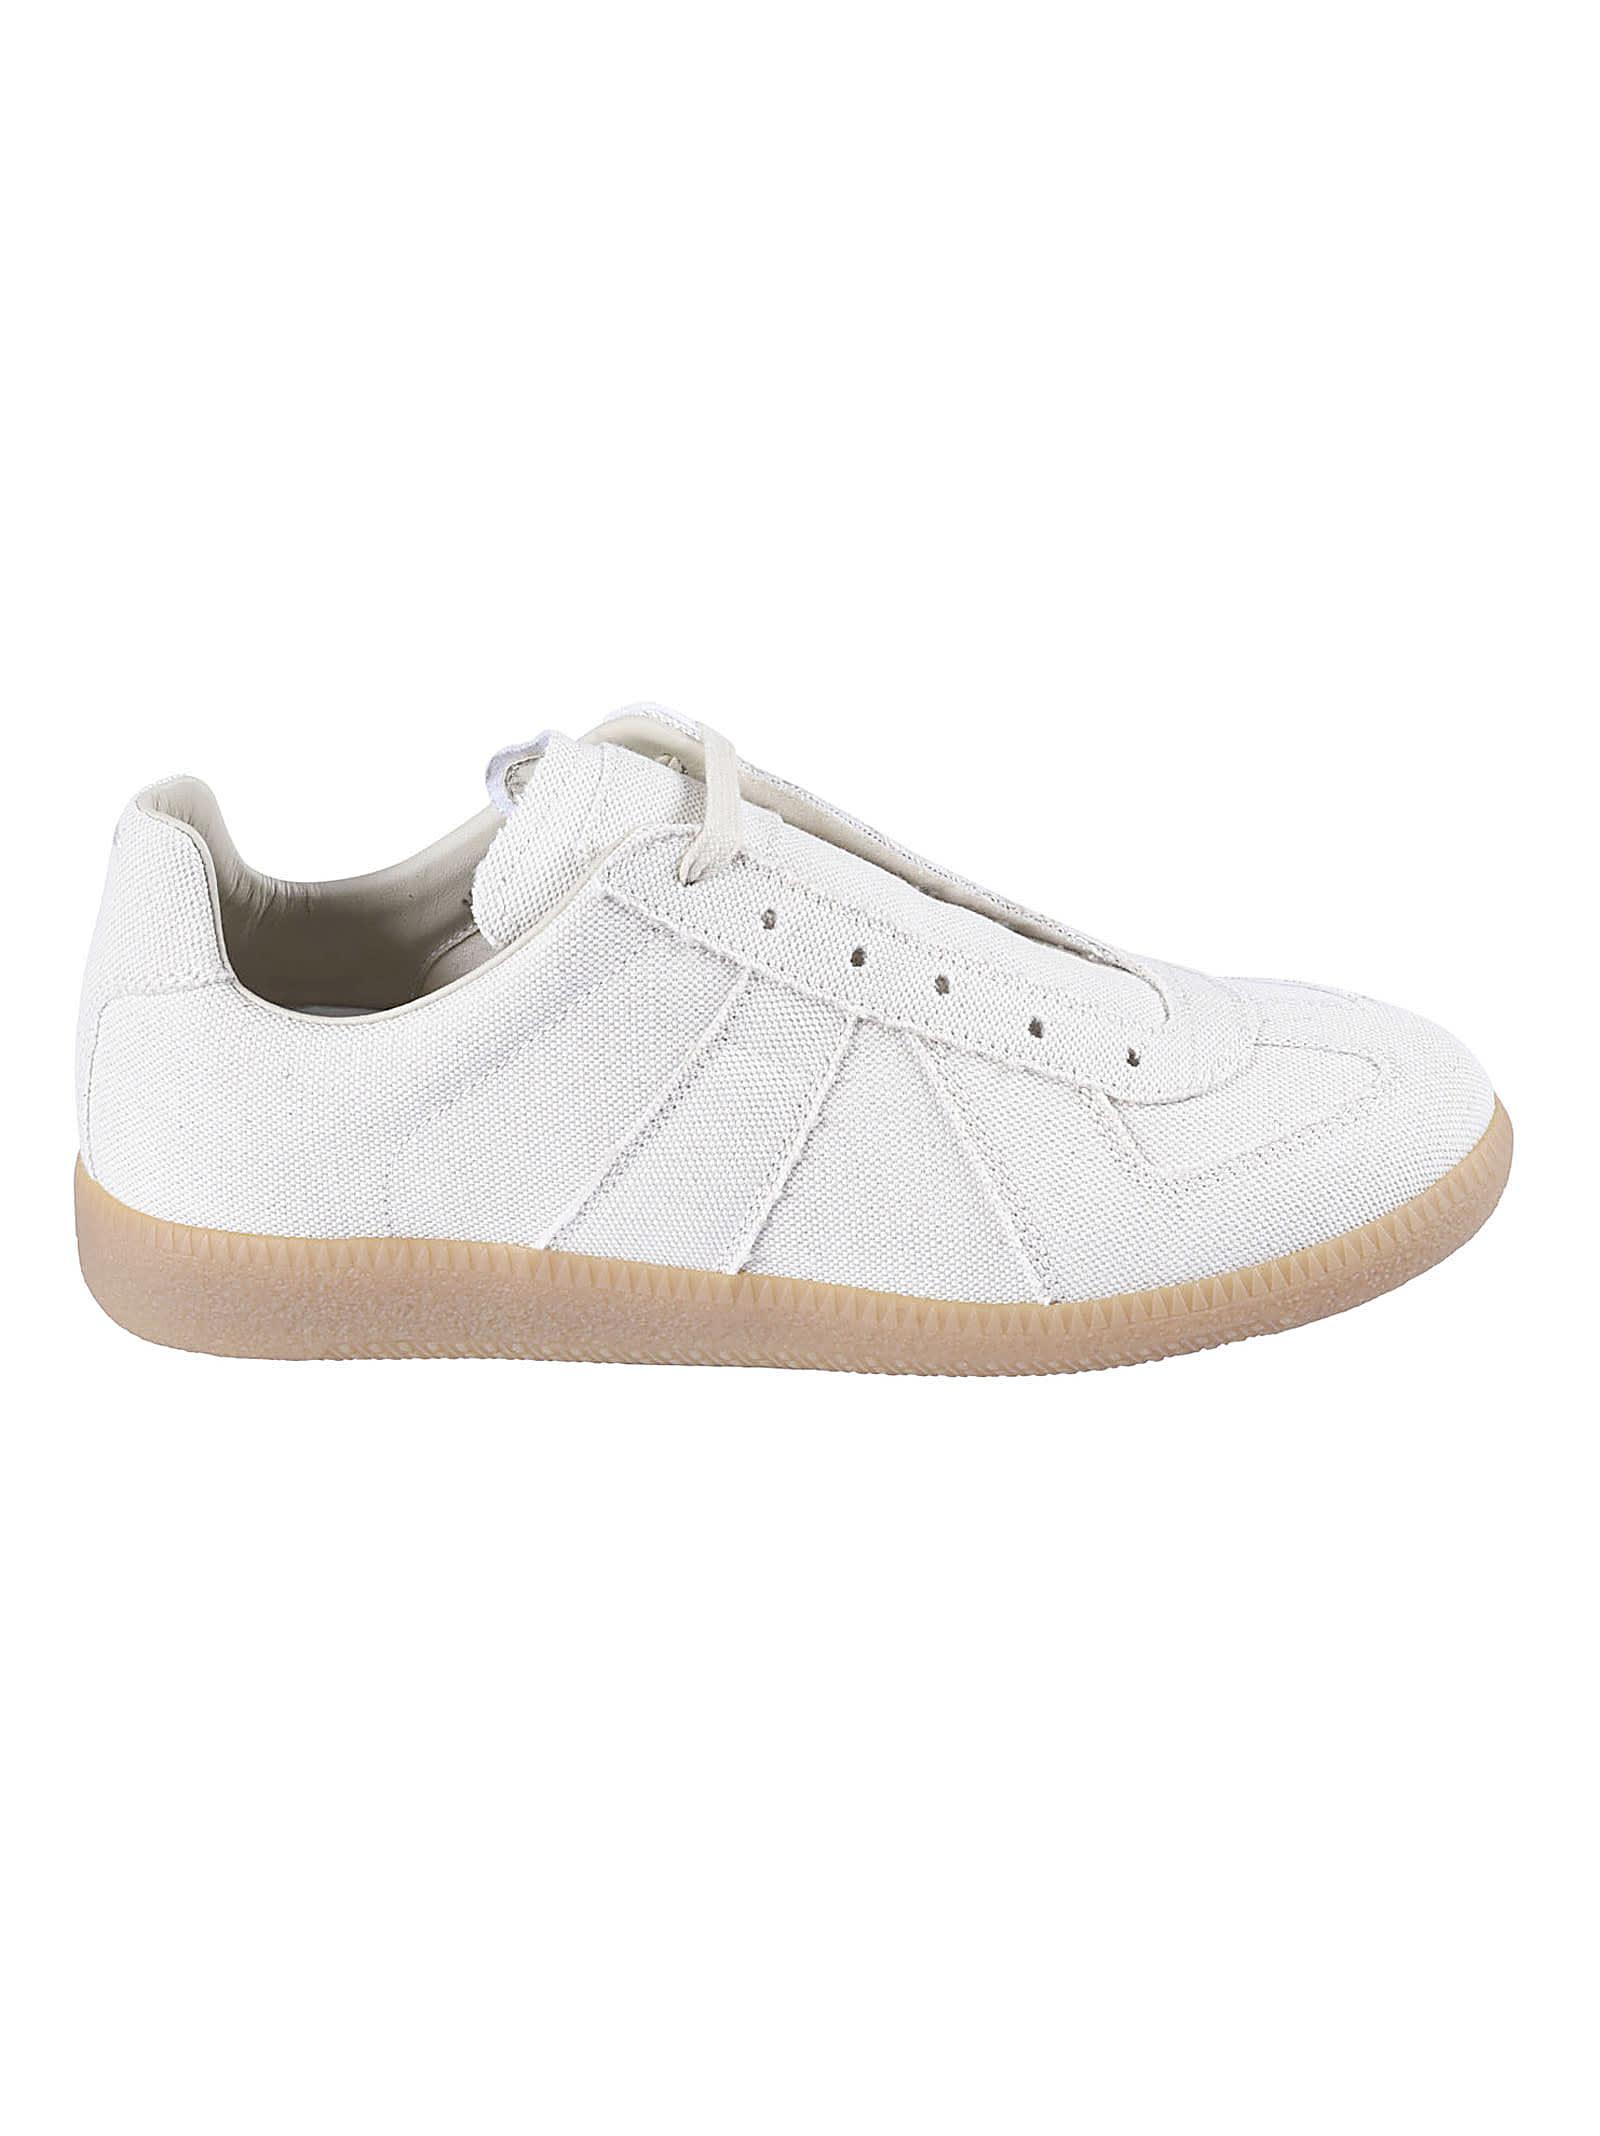 Buy Maison Margiela Classic Mesh Sneakers online, shop Maison Margiela shoes with free shipping